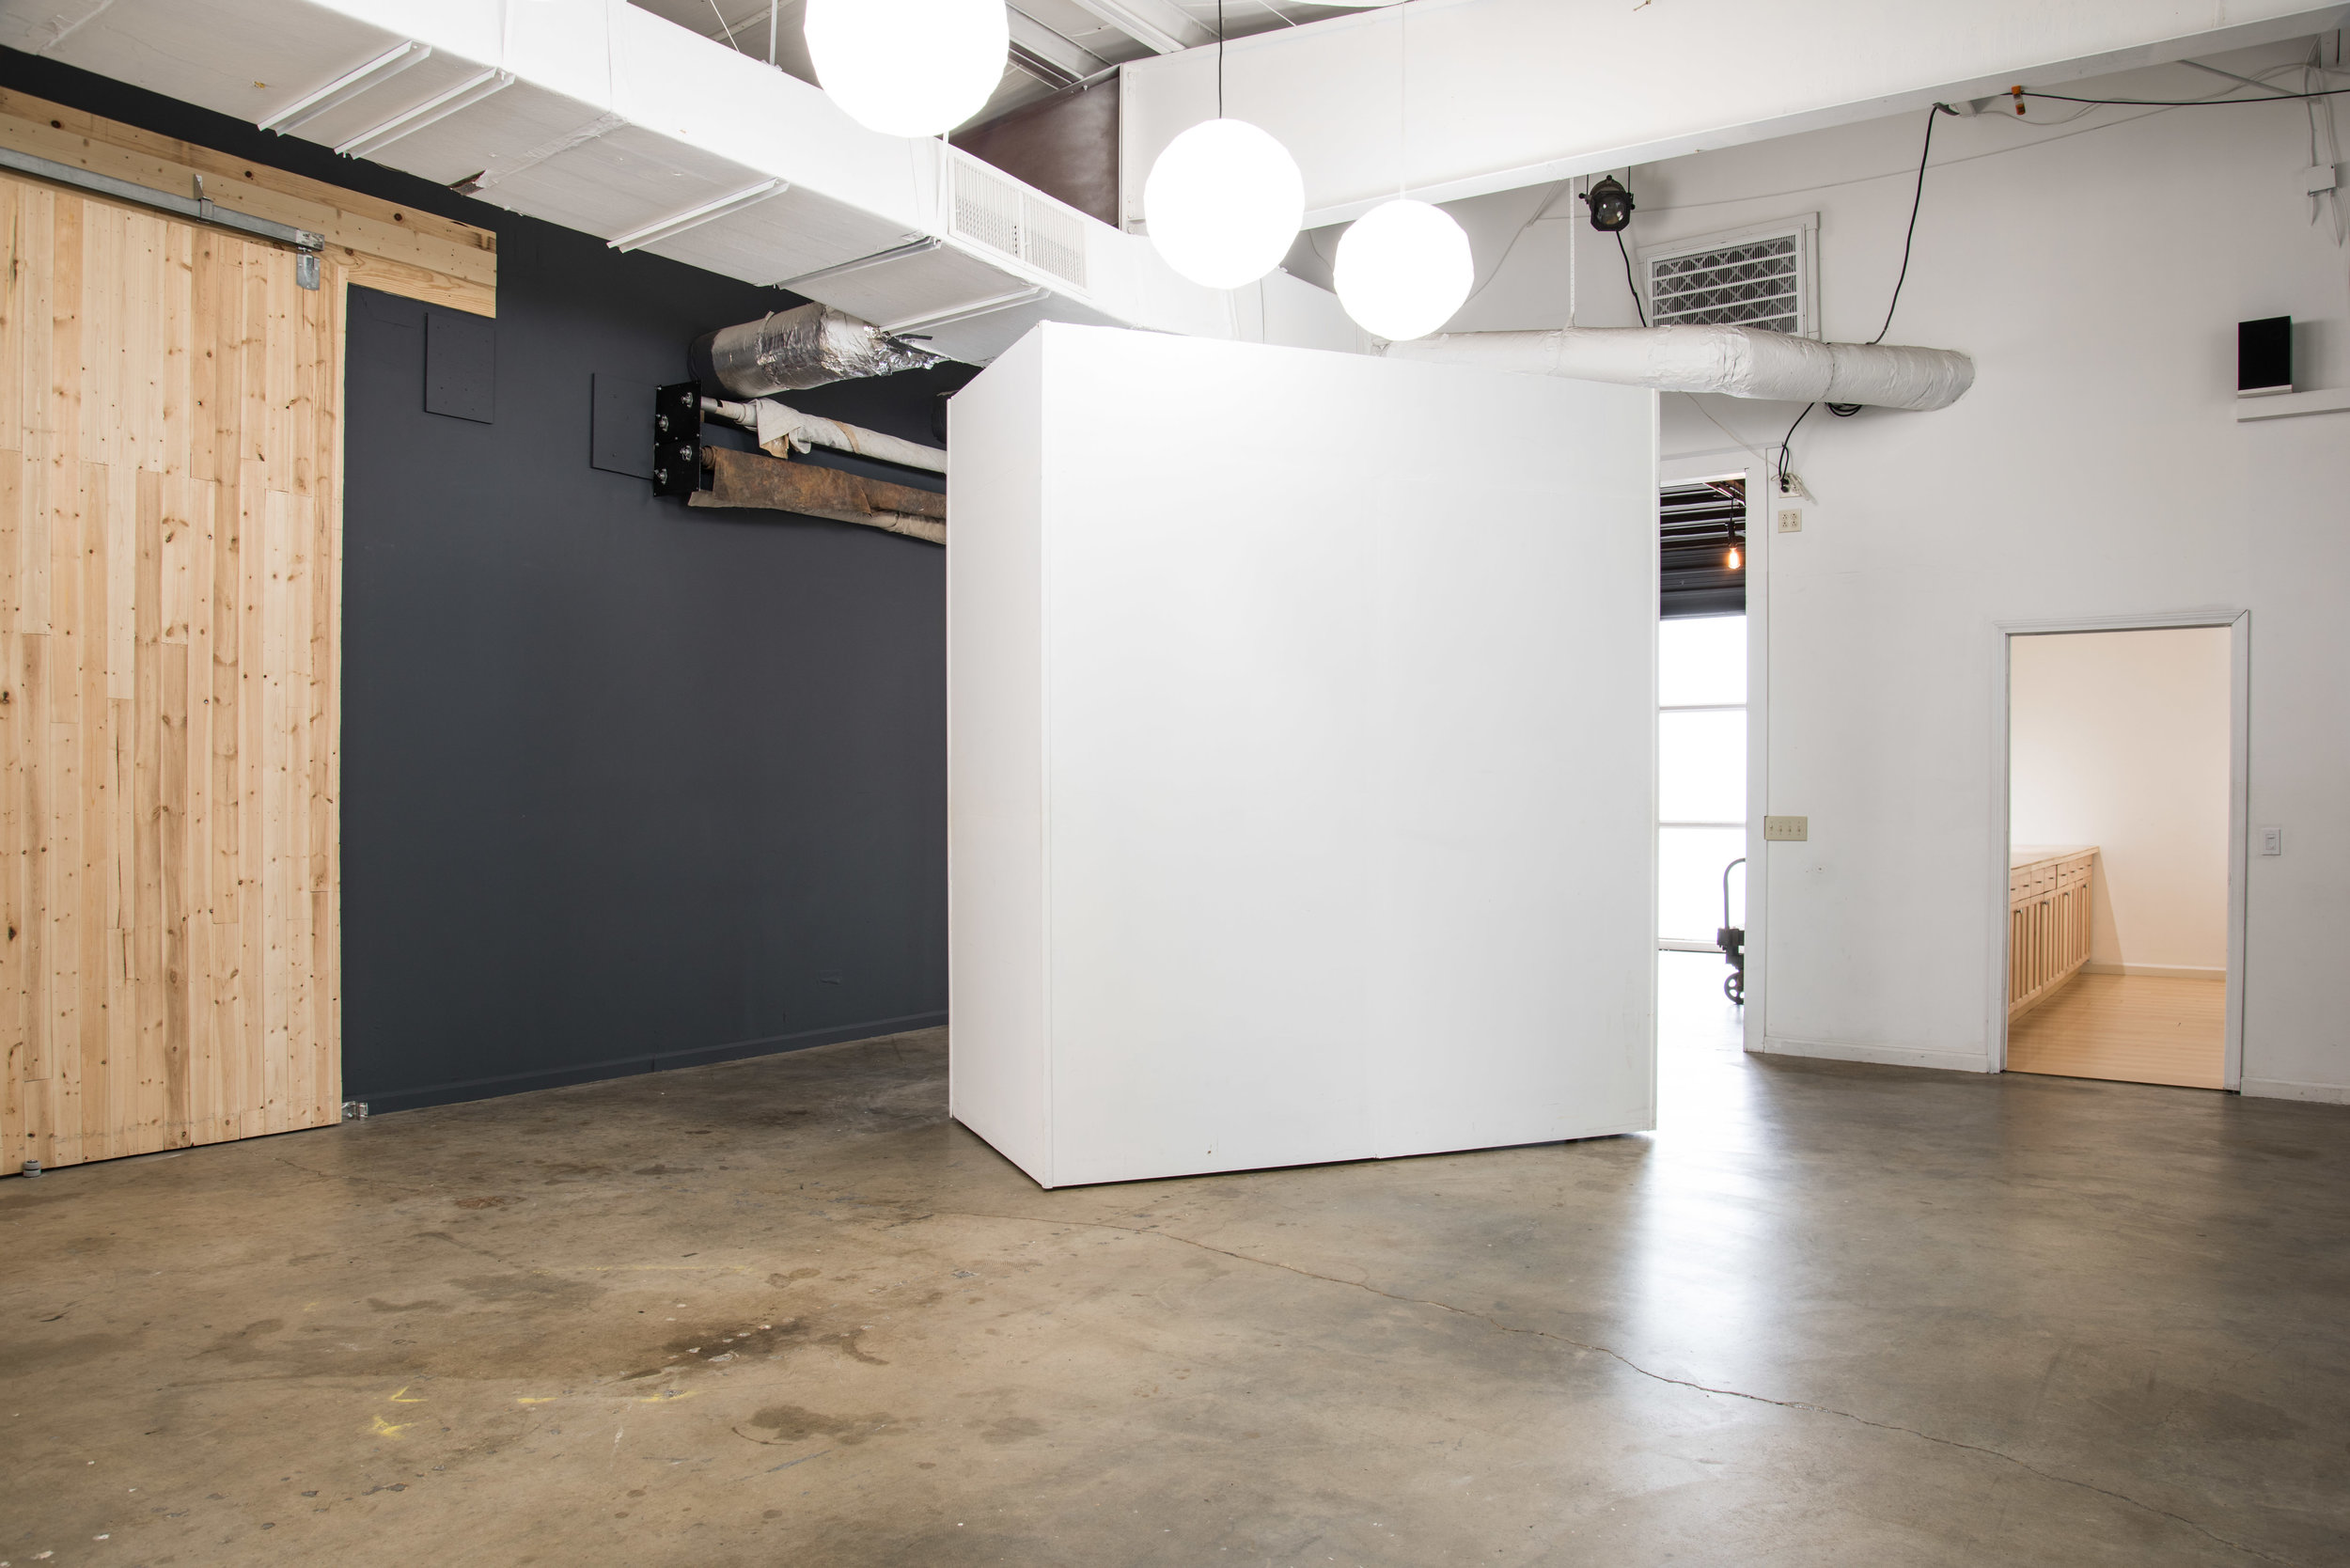 Westlight Studios Rolling Backdrop Option